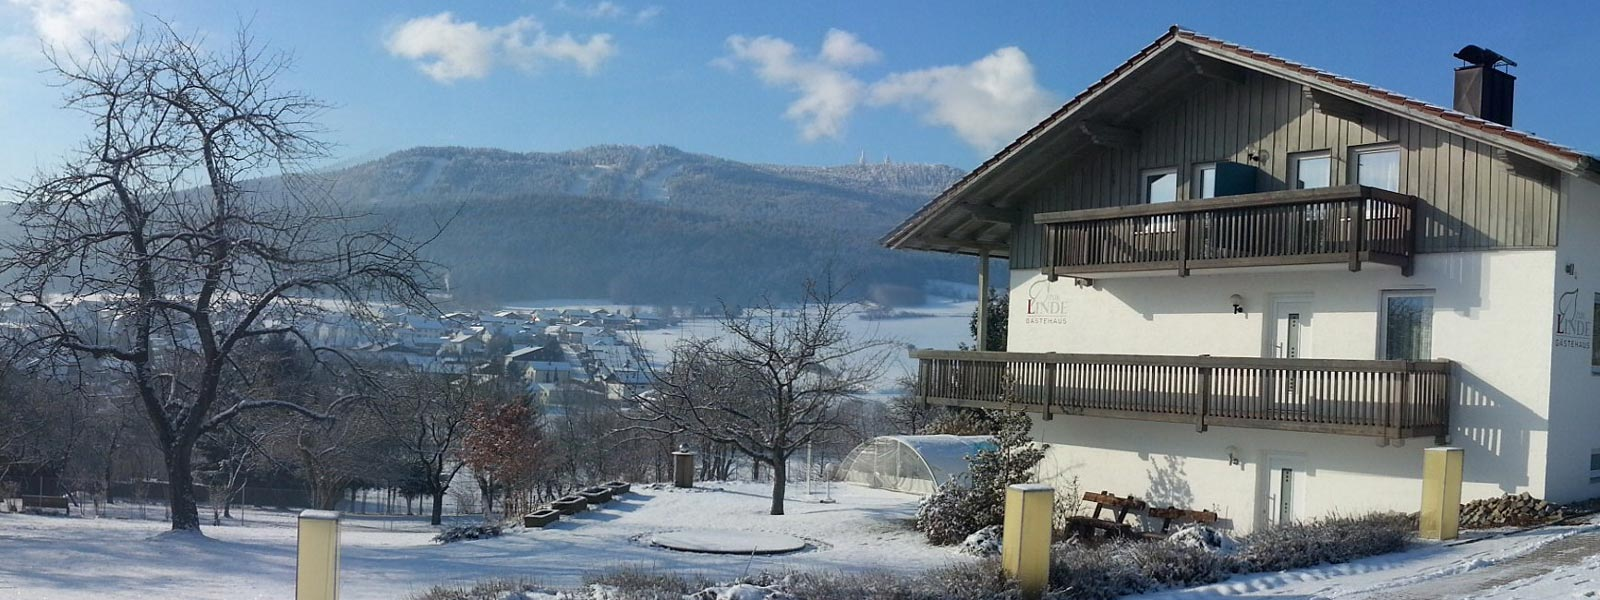 Panoramamithaus.jpg